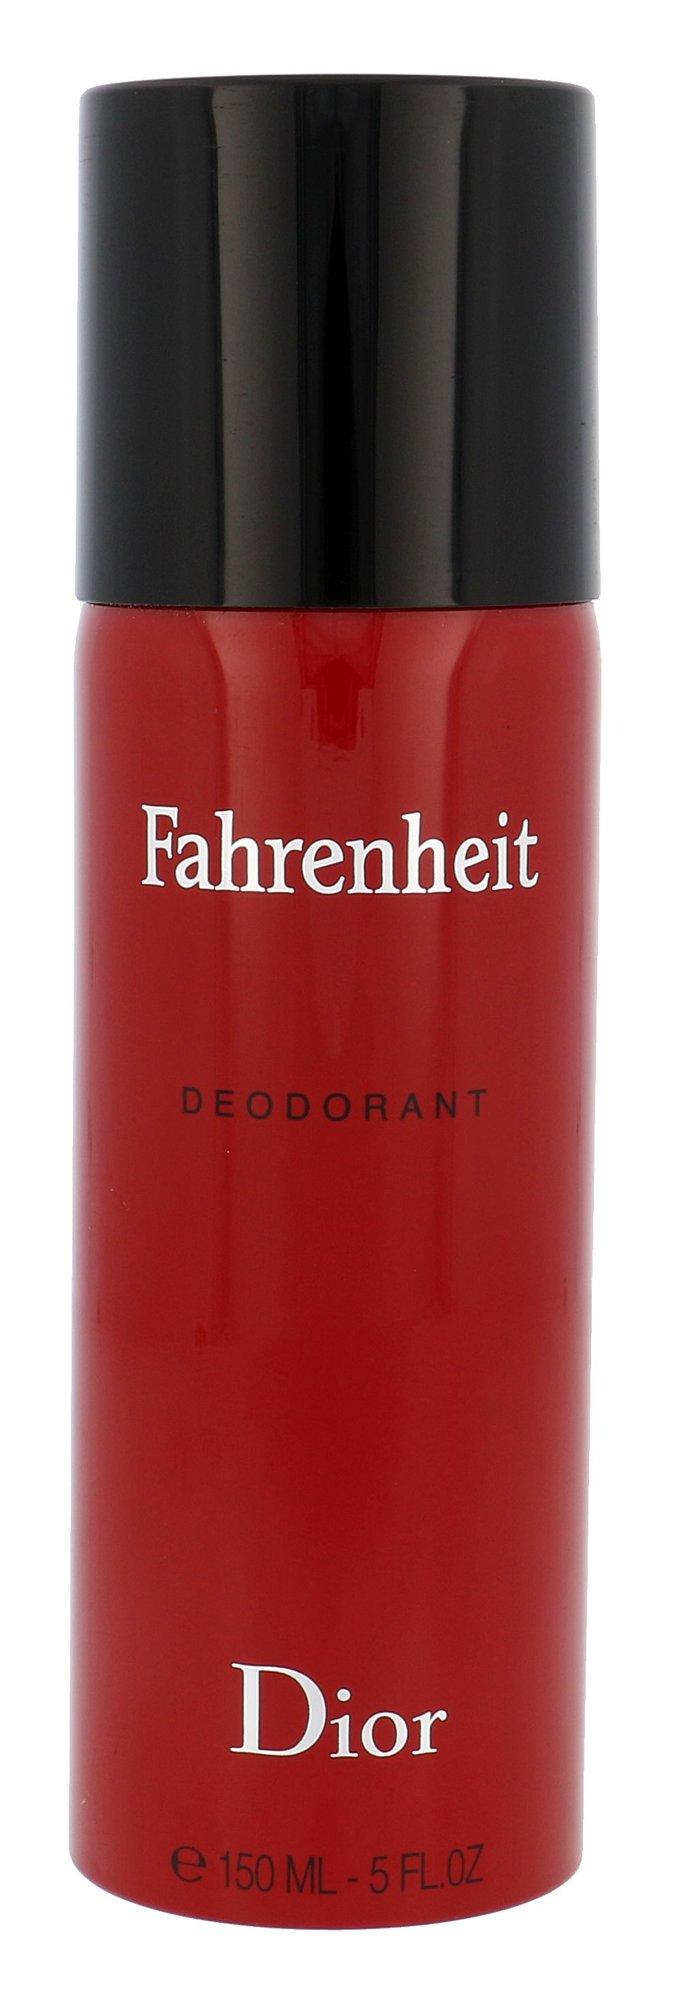 Christian Dior Fahrenheit Deodorant 150ml